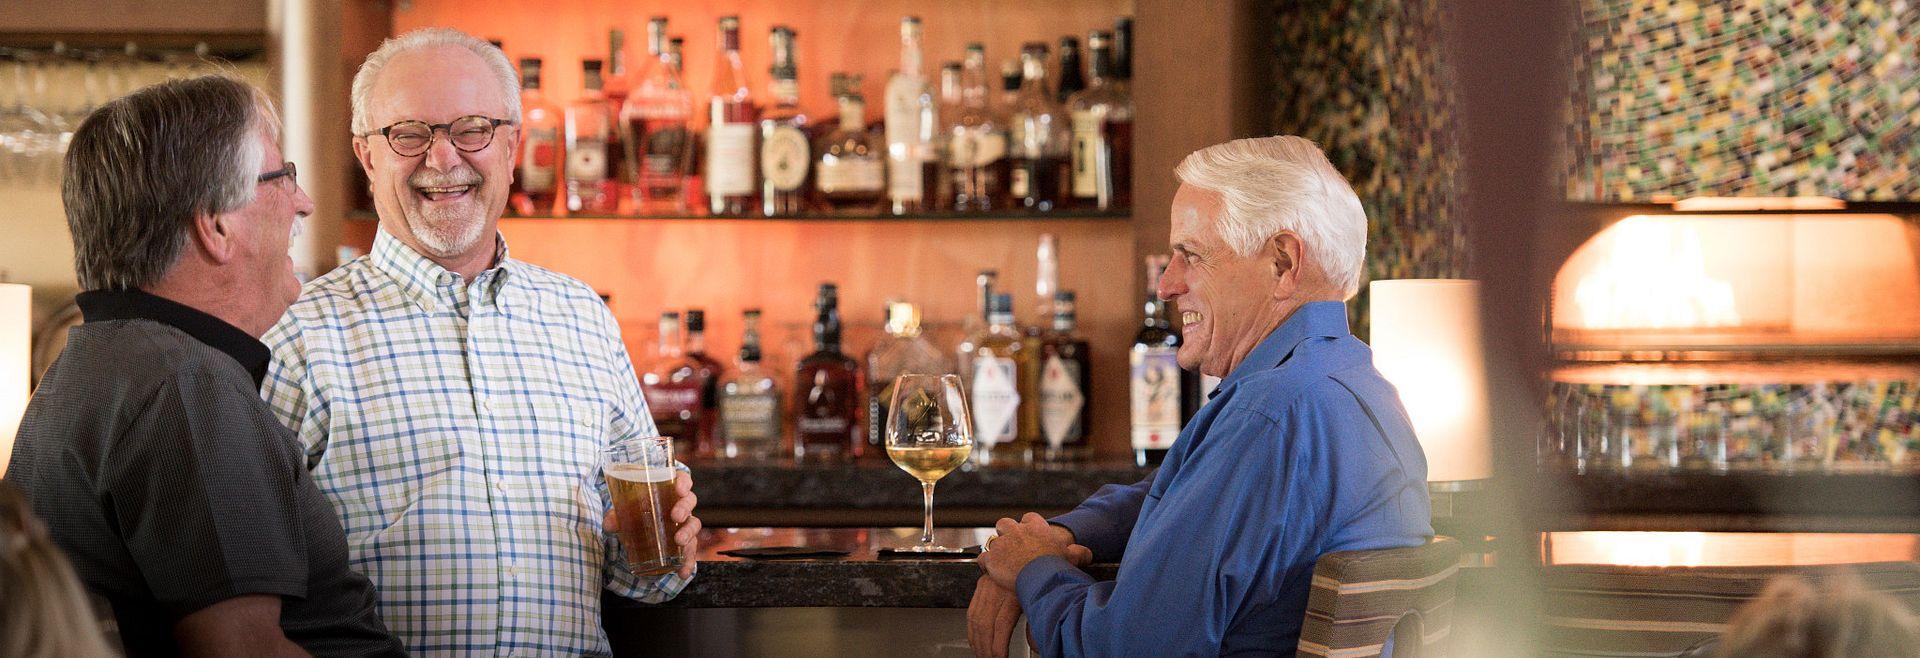 Men enjoying a drink at the bar